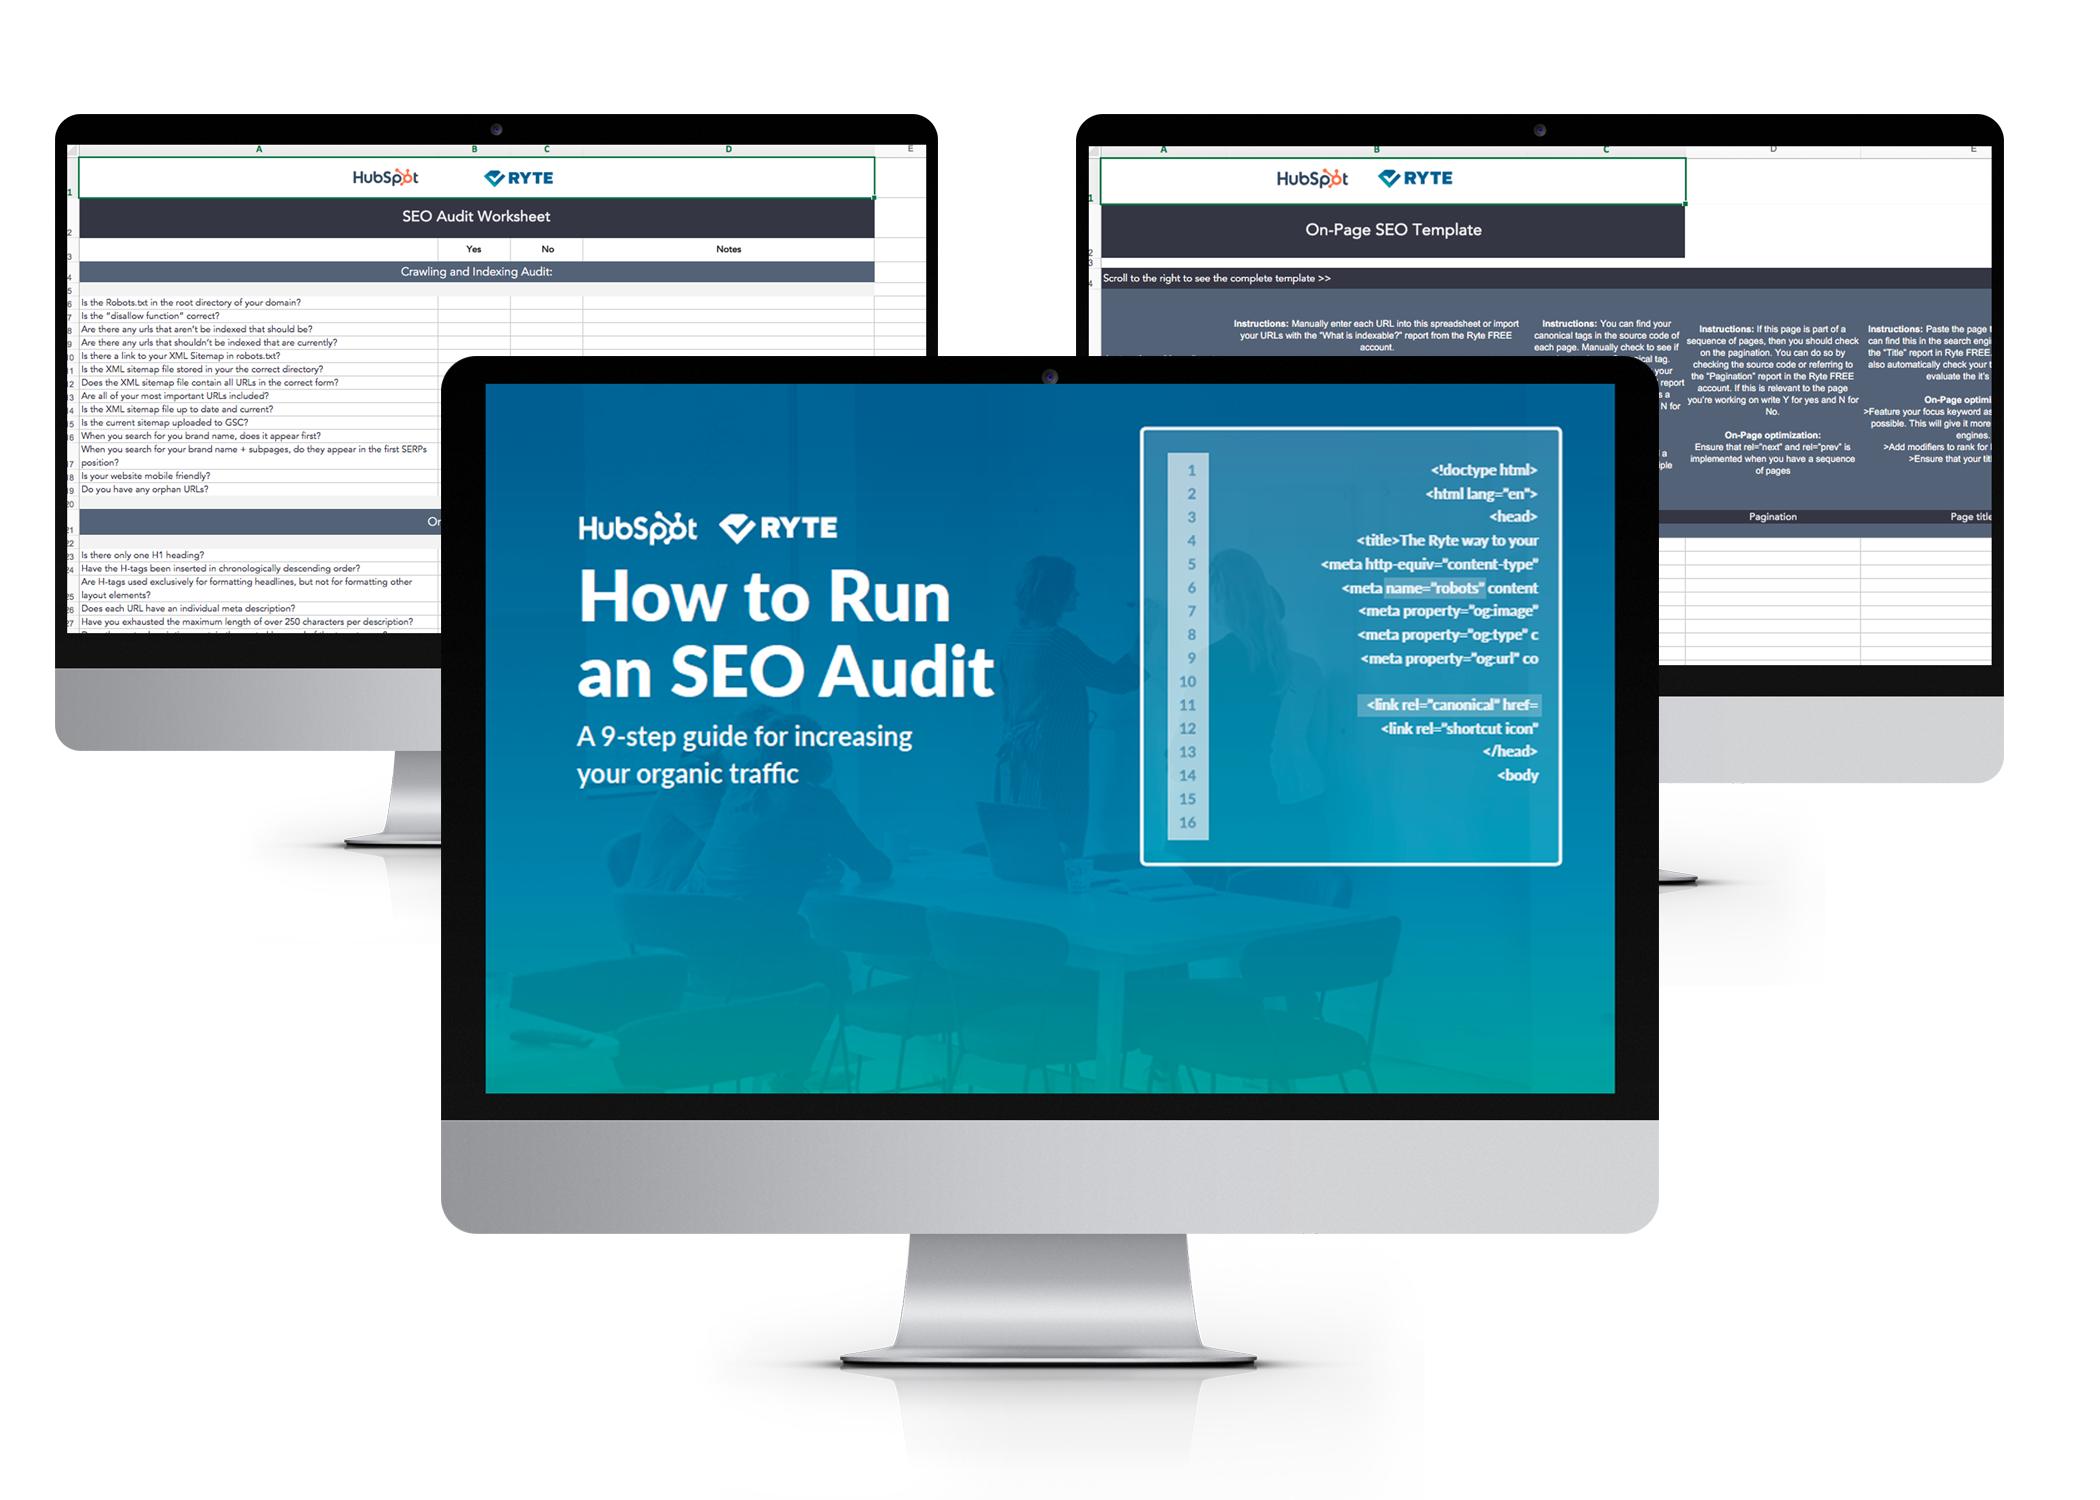 How to Run an SEO Audit